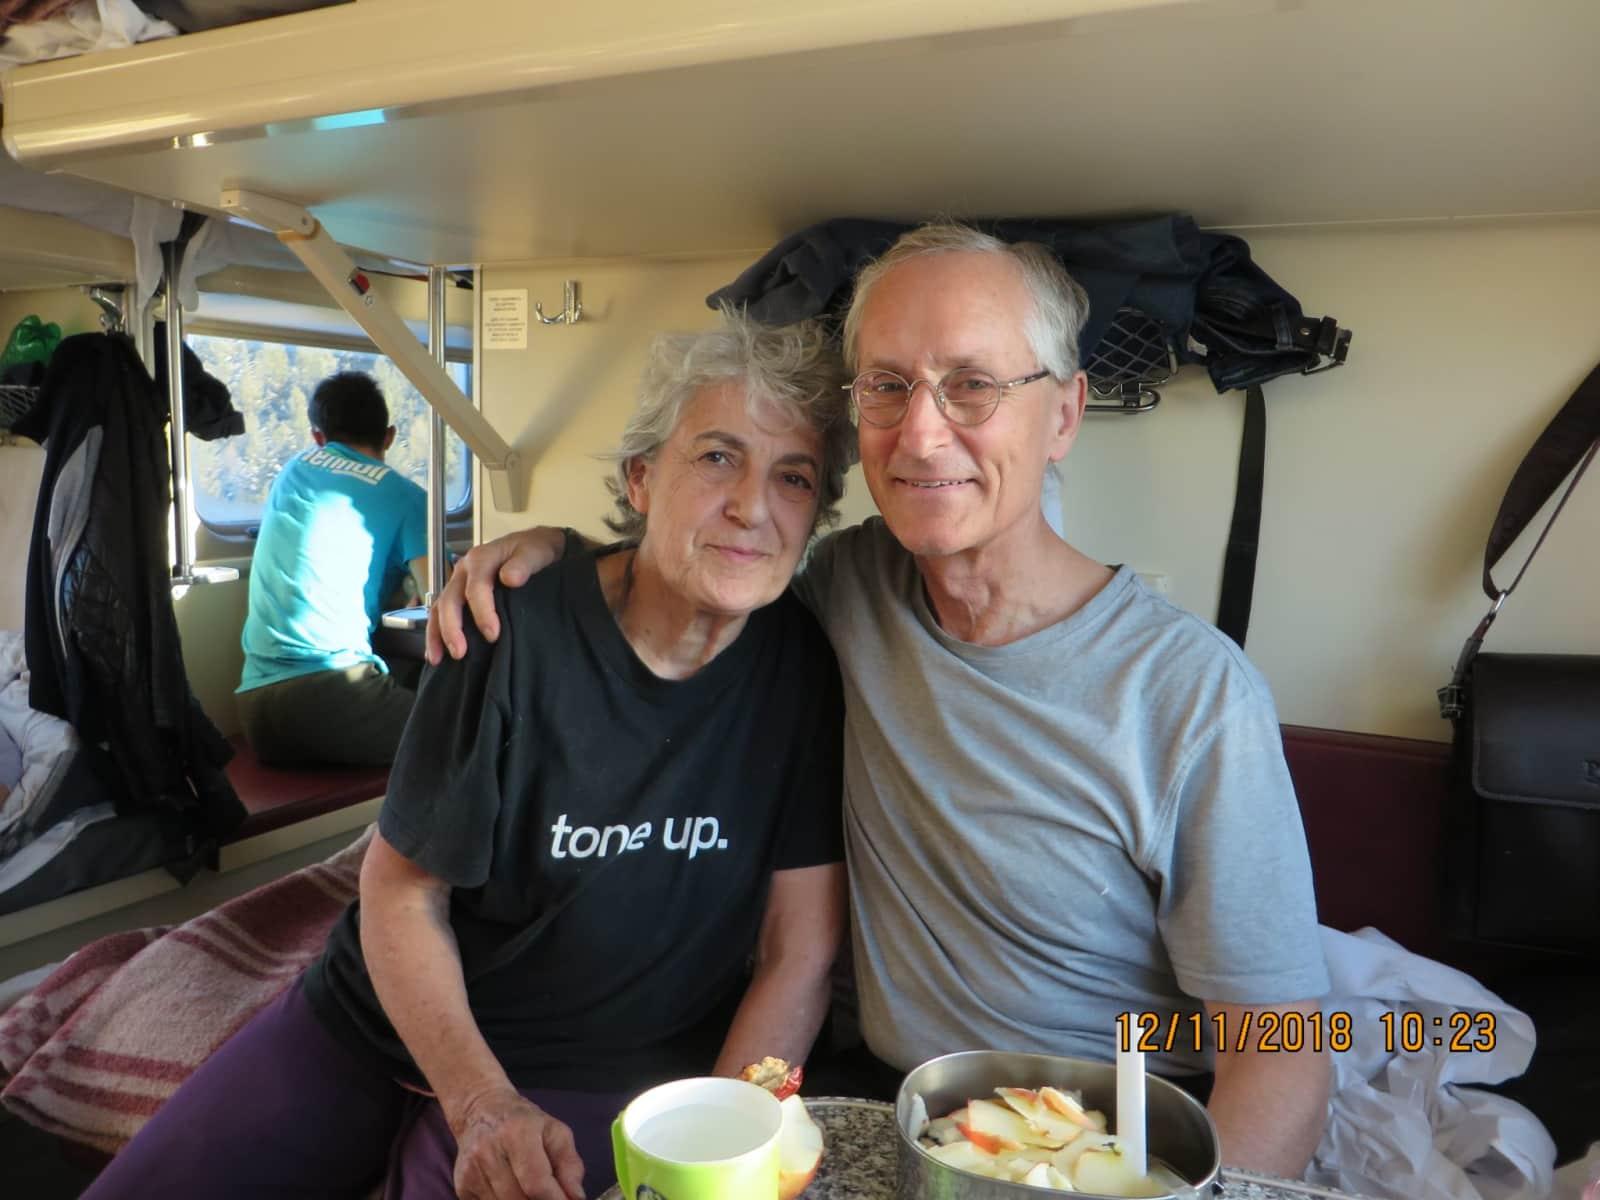 Maxien & Craig from Shepparton, Victoria, Australia